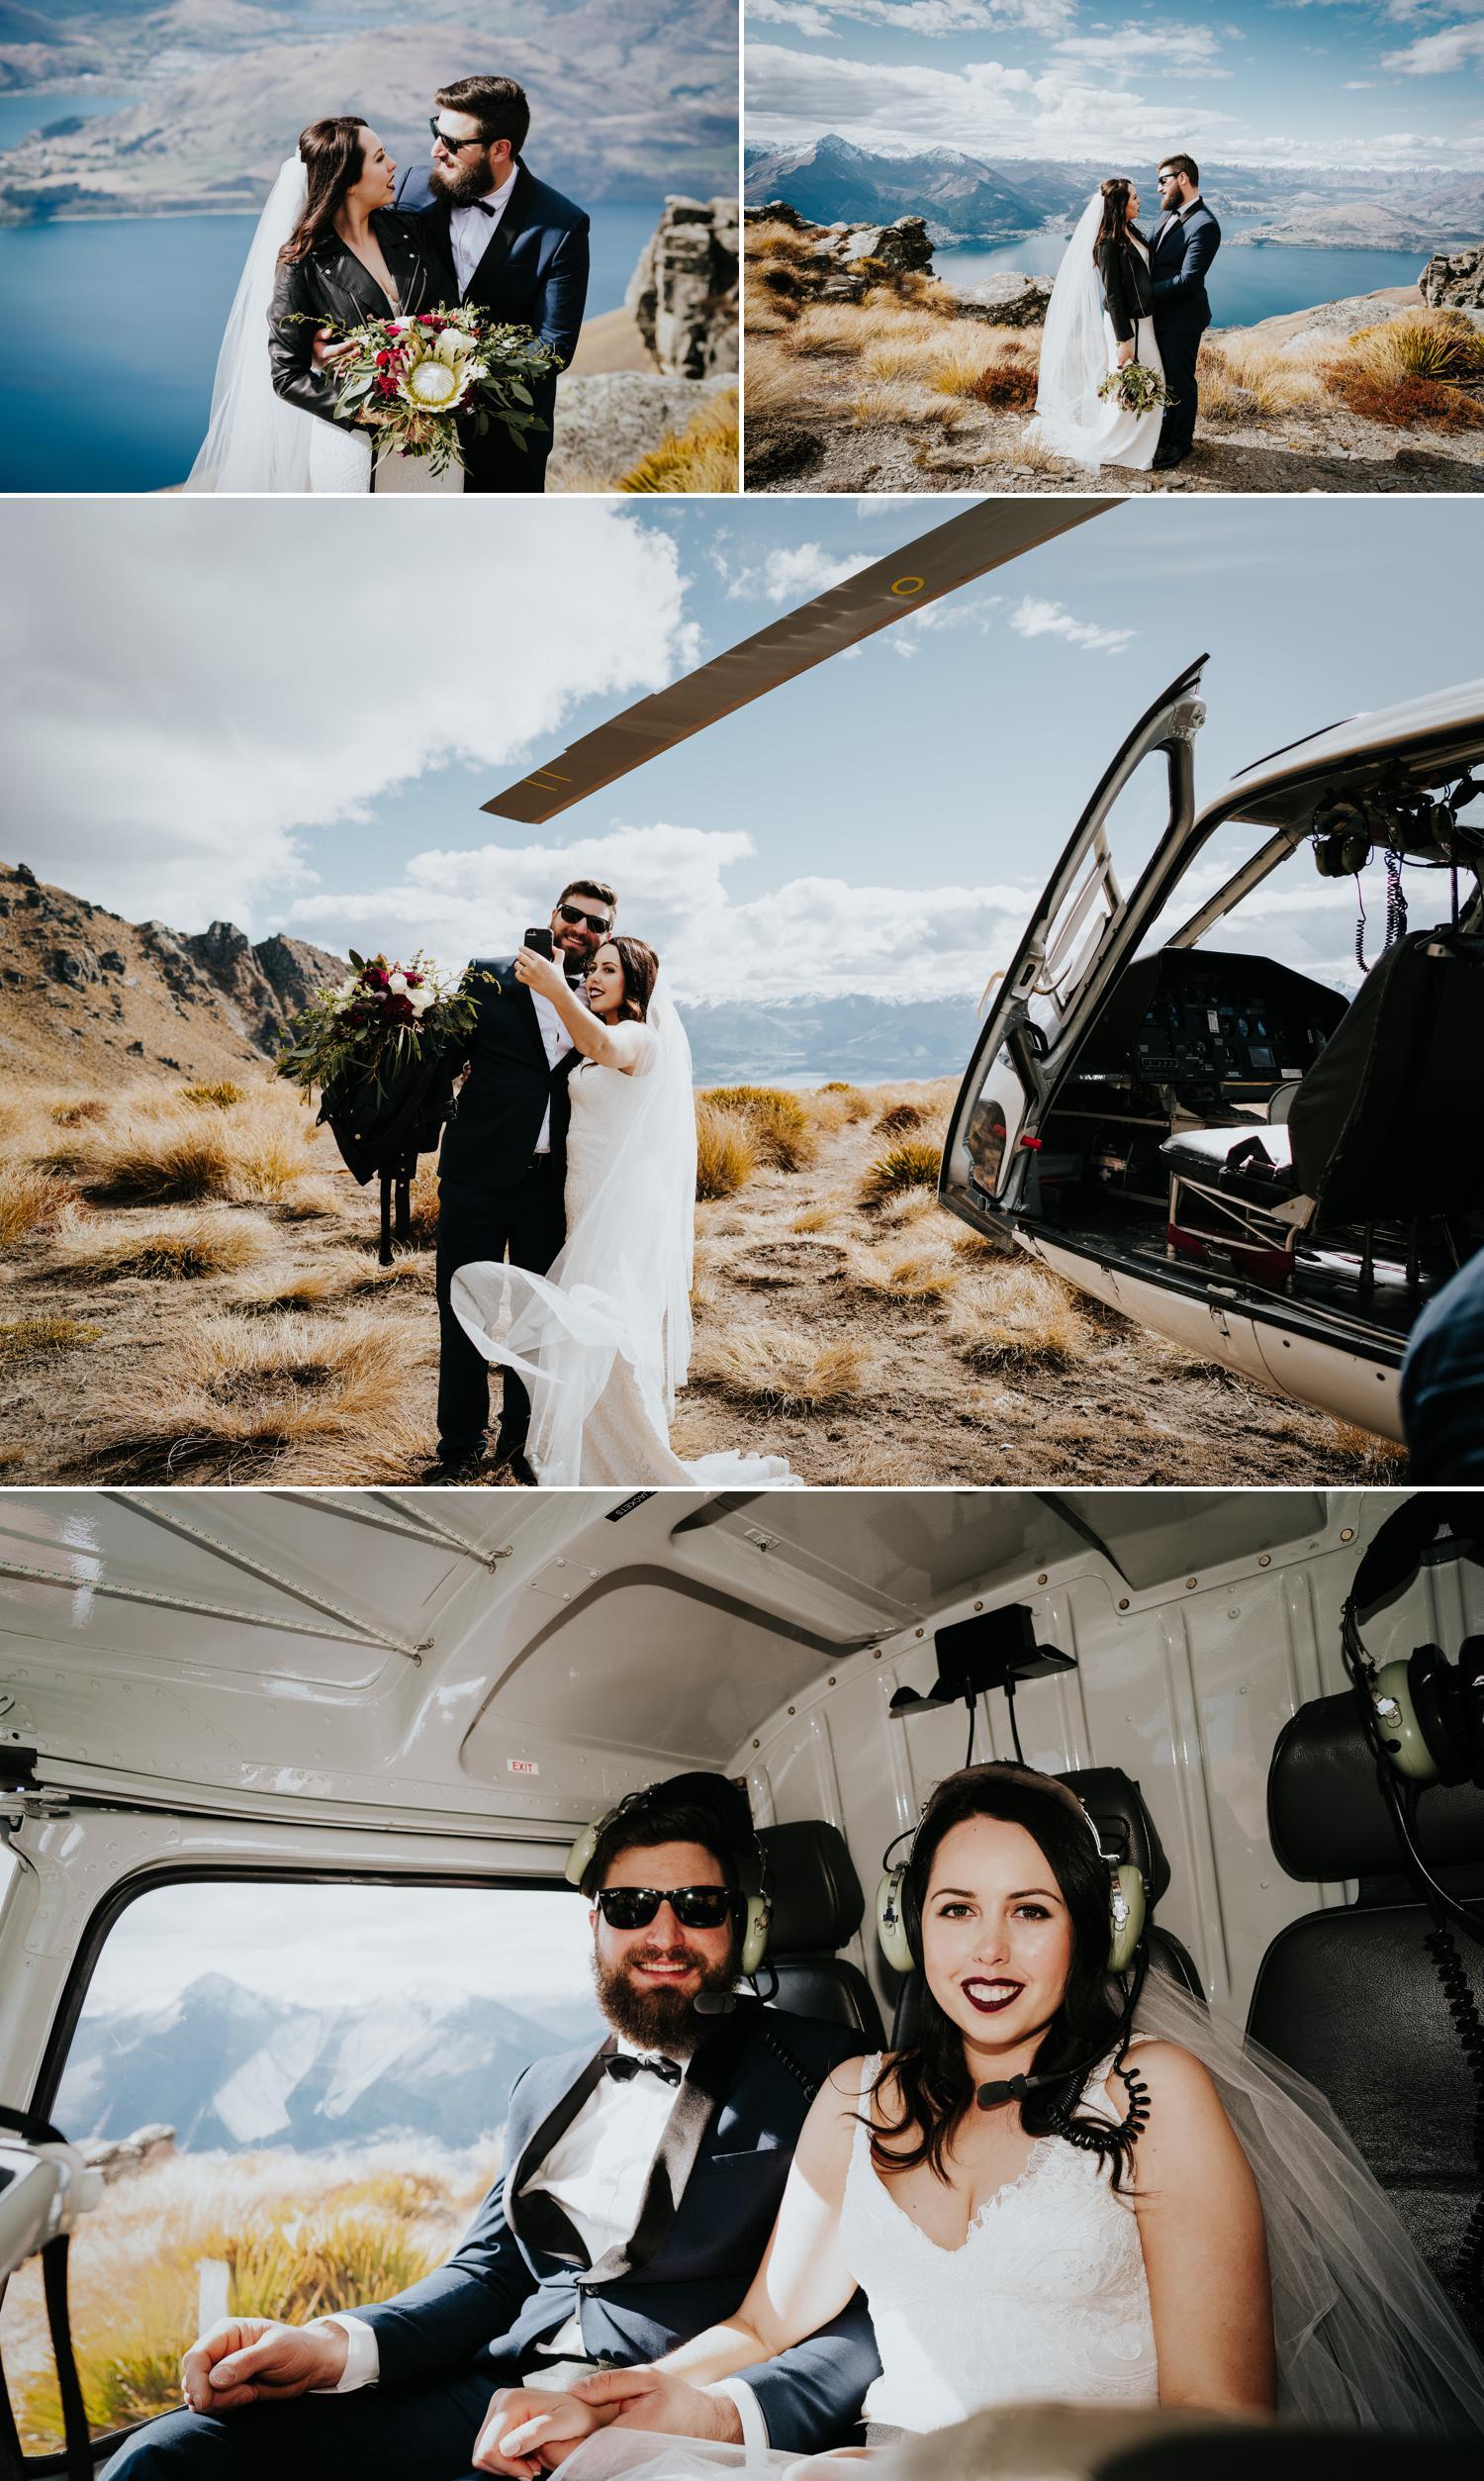 Queenstown mountain wedding planner